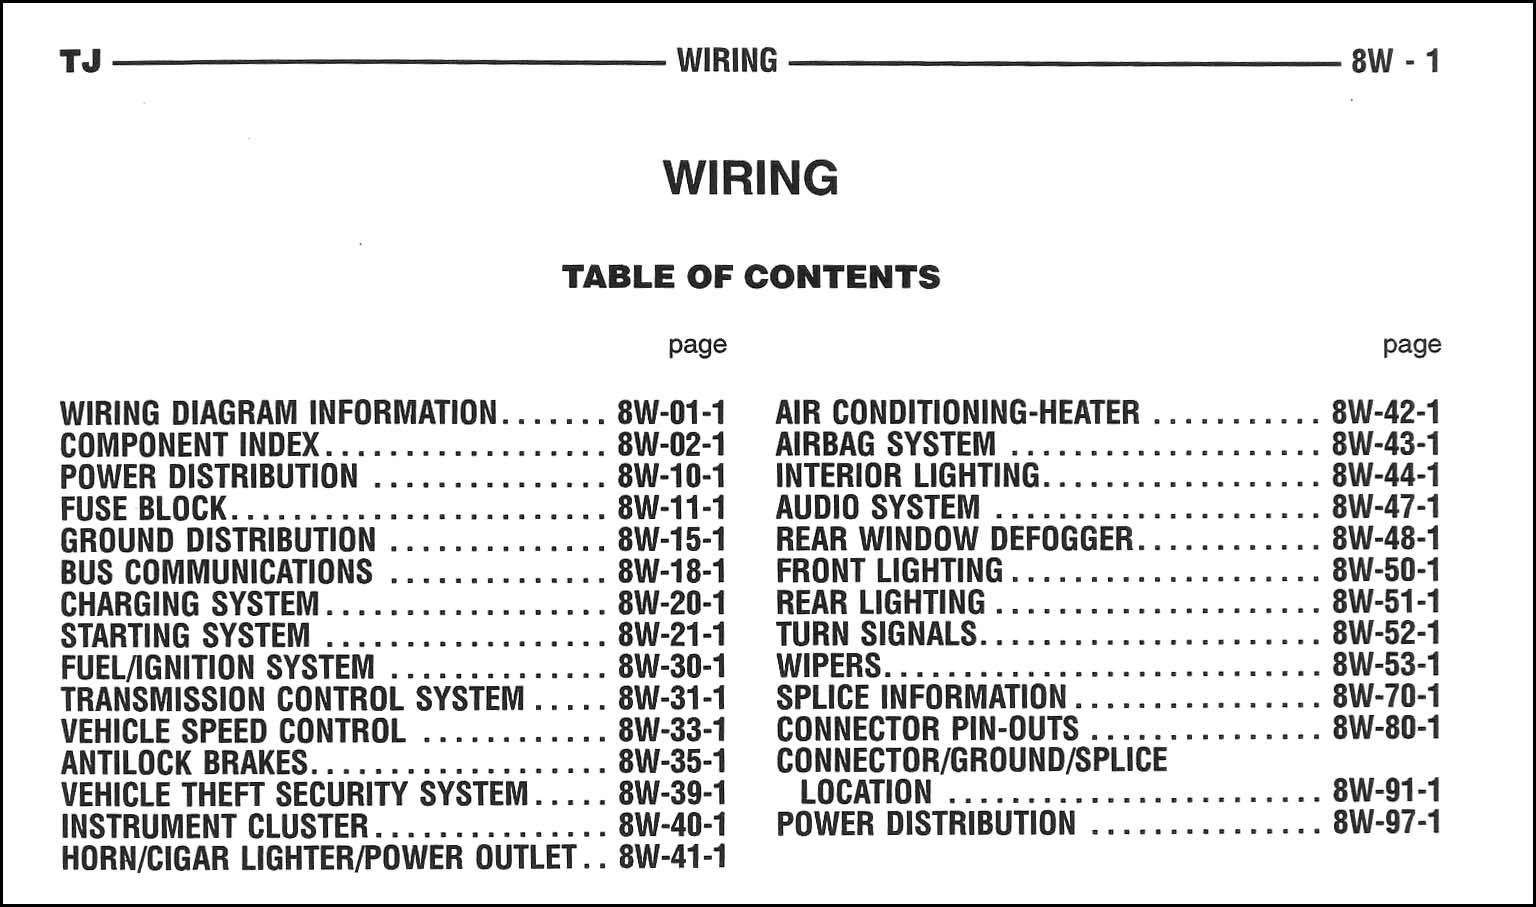 Jeep Tj Wiring Diagram - Wiring Diagrams - Jeep Wrangler Wiring Diagram